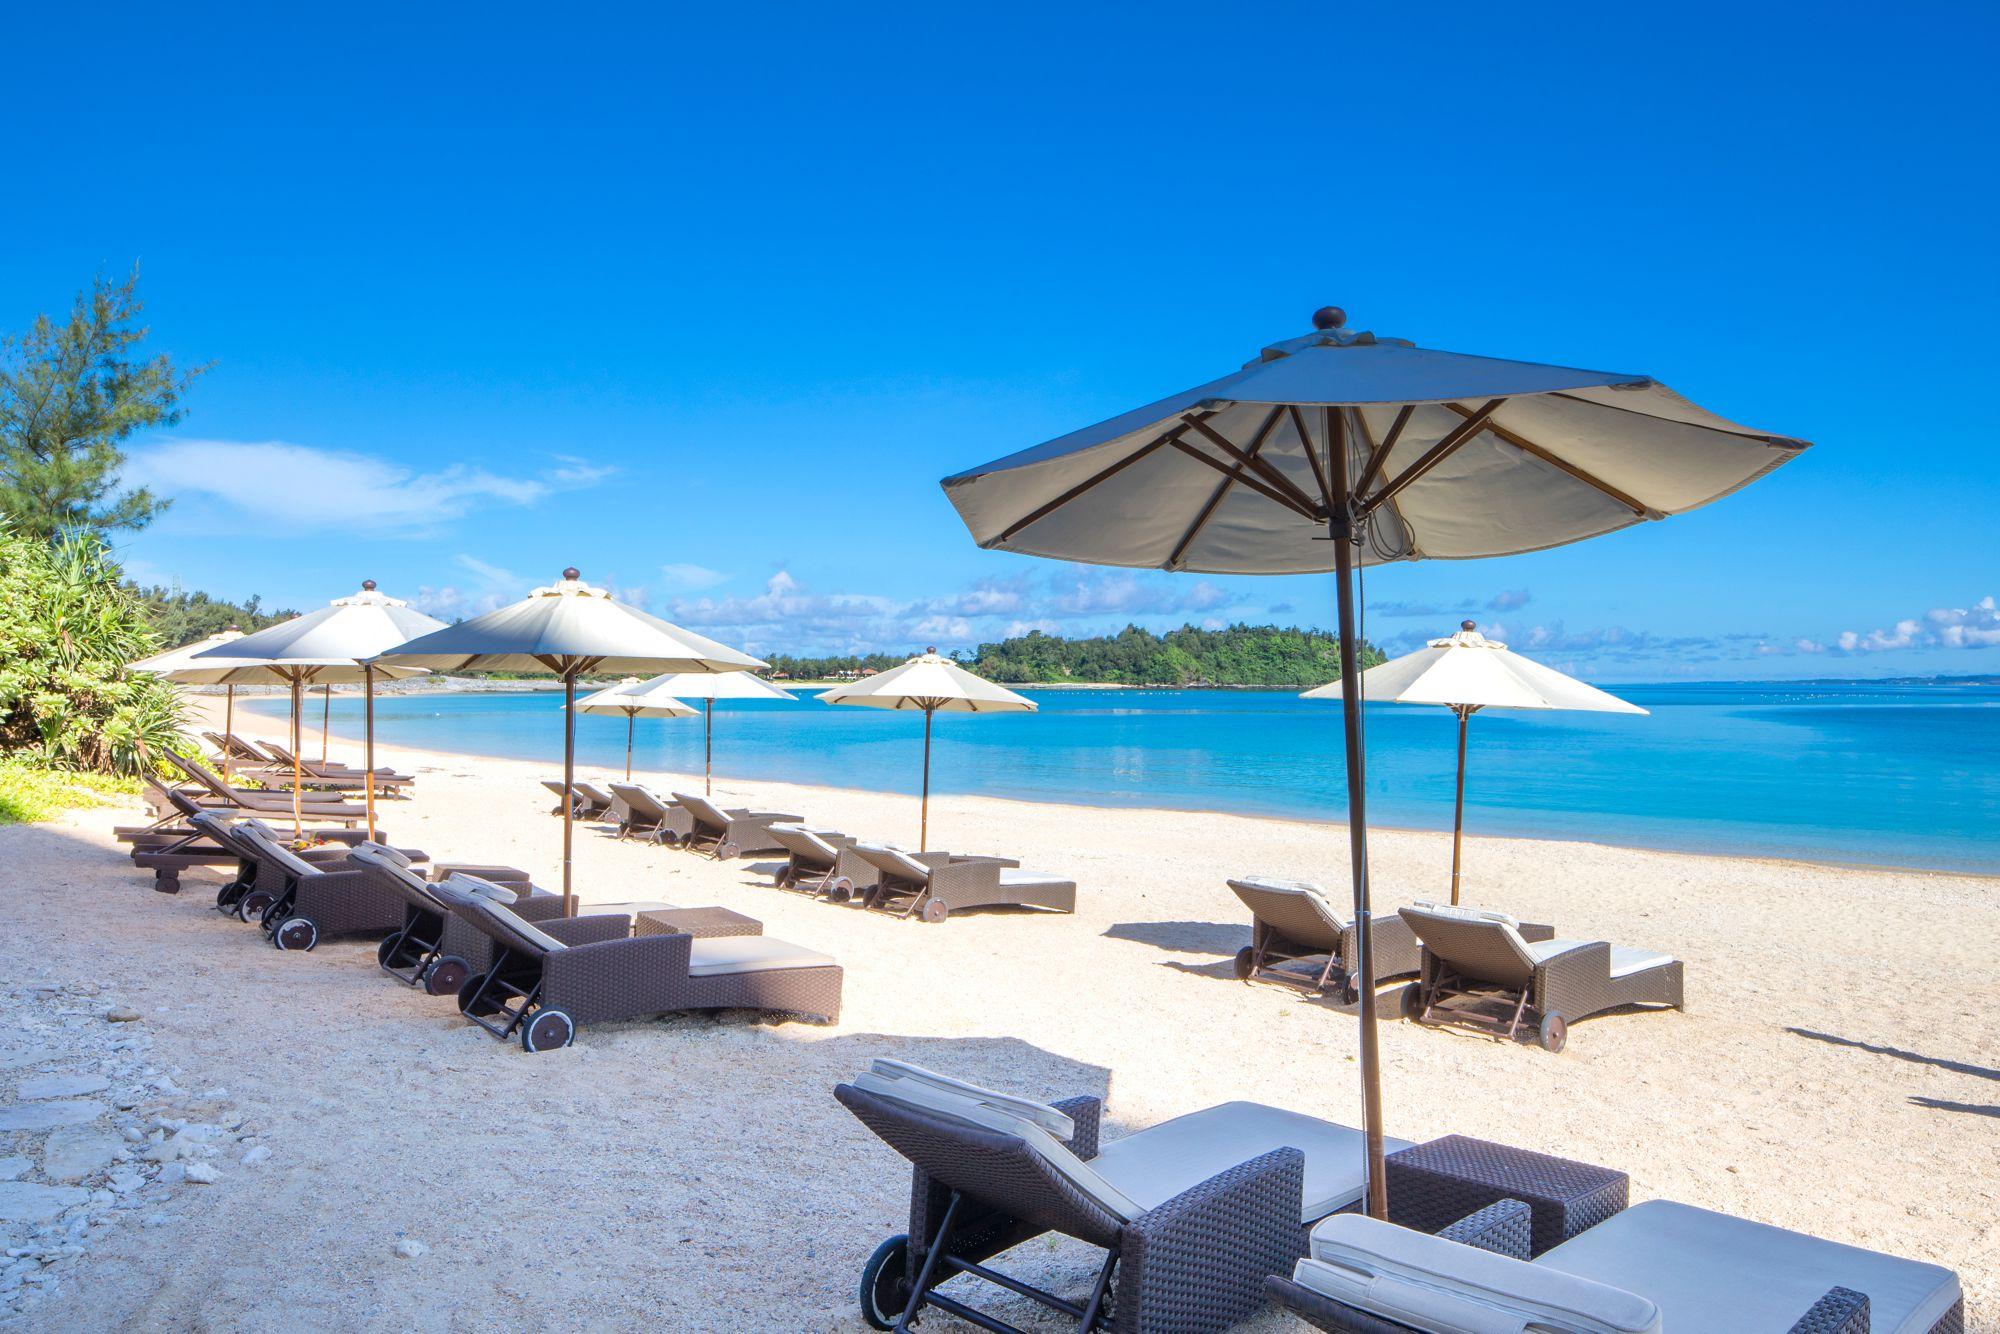 Groovy Luxury Beach Resorts Beachfront Hotels The Ritz Carlton Forskolin Free Trial Chair Design Images Forskolin Free Trialorg